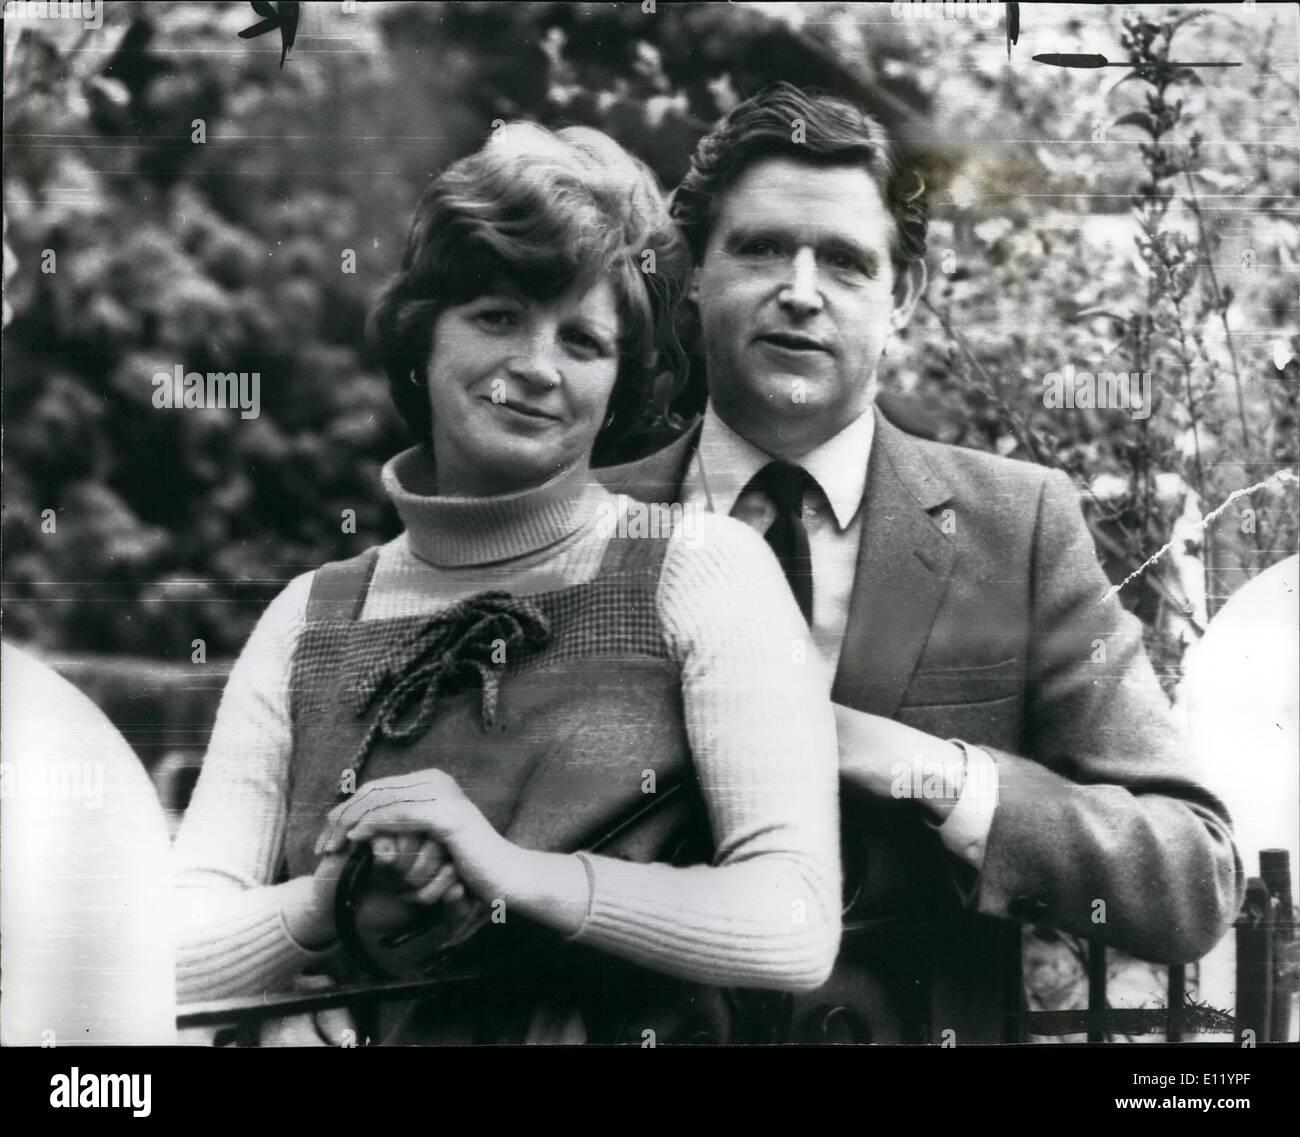 Apr. 04, 1981 - Tory M.P. receives I.R.A. letter bomb.: Mr. Barry Porter, Conservative MP fir Bebington and Ellesmere Stock Photo